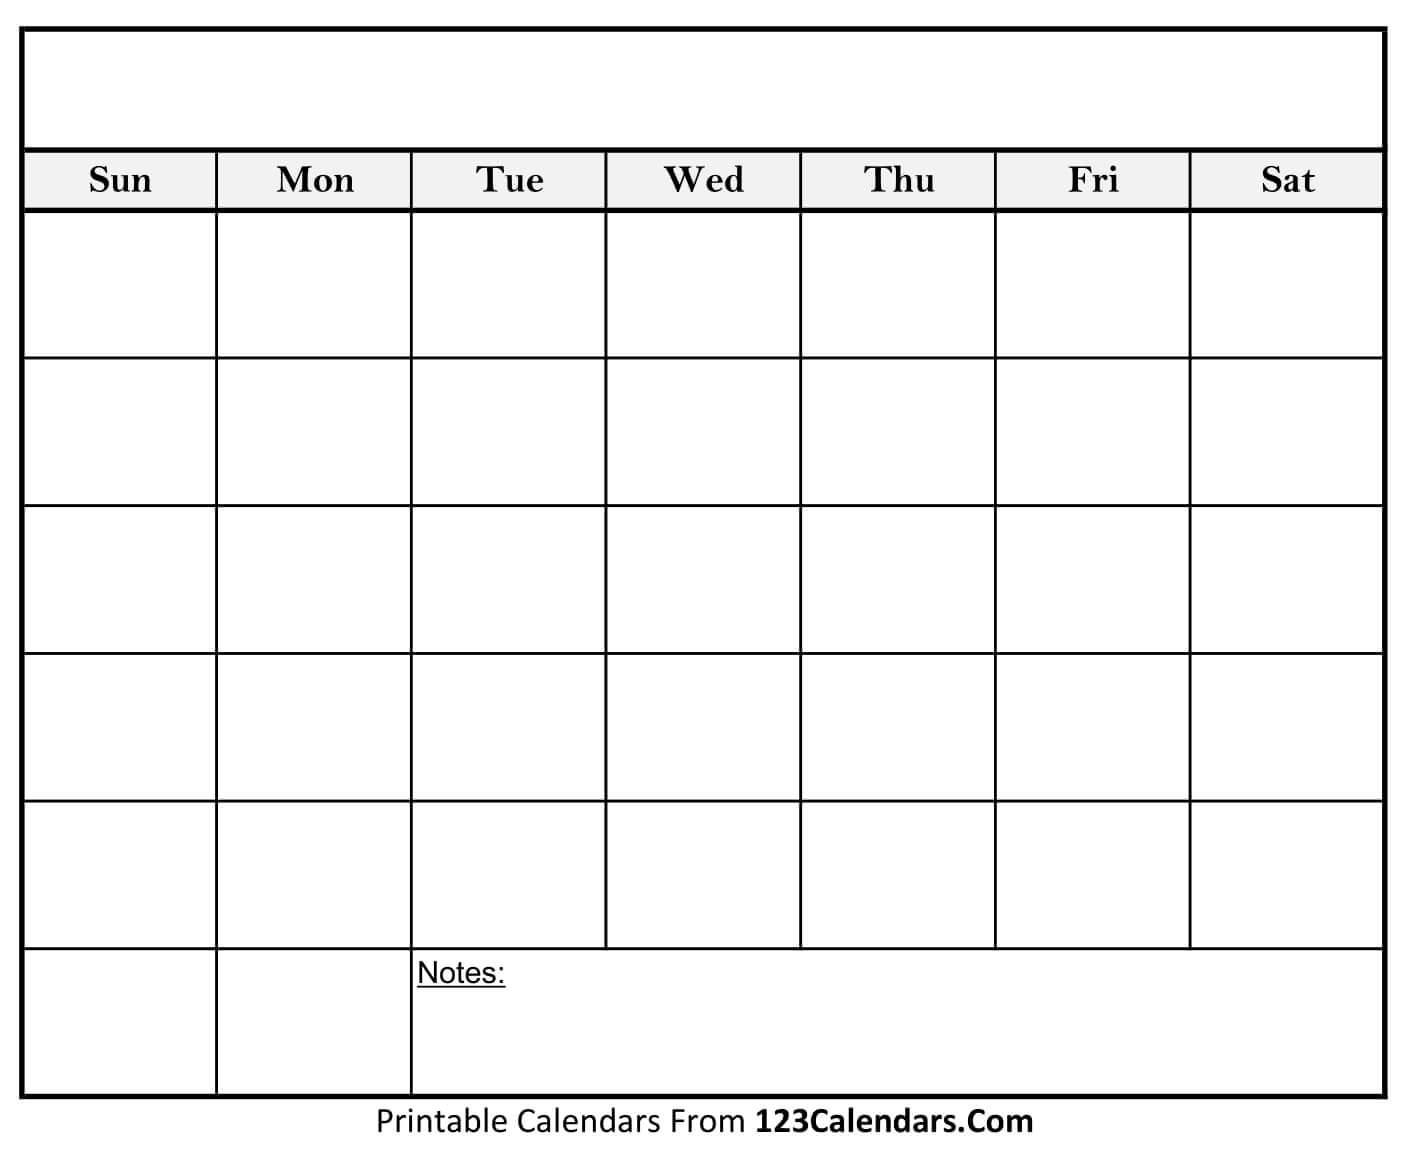 Free Printable Blank Calendar | 123Calendars-Calendar Blank With Numbers And Printable